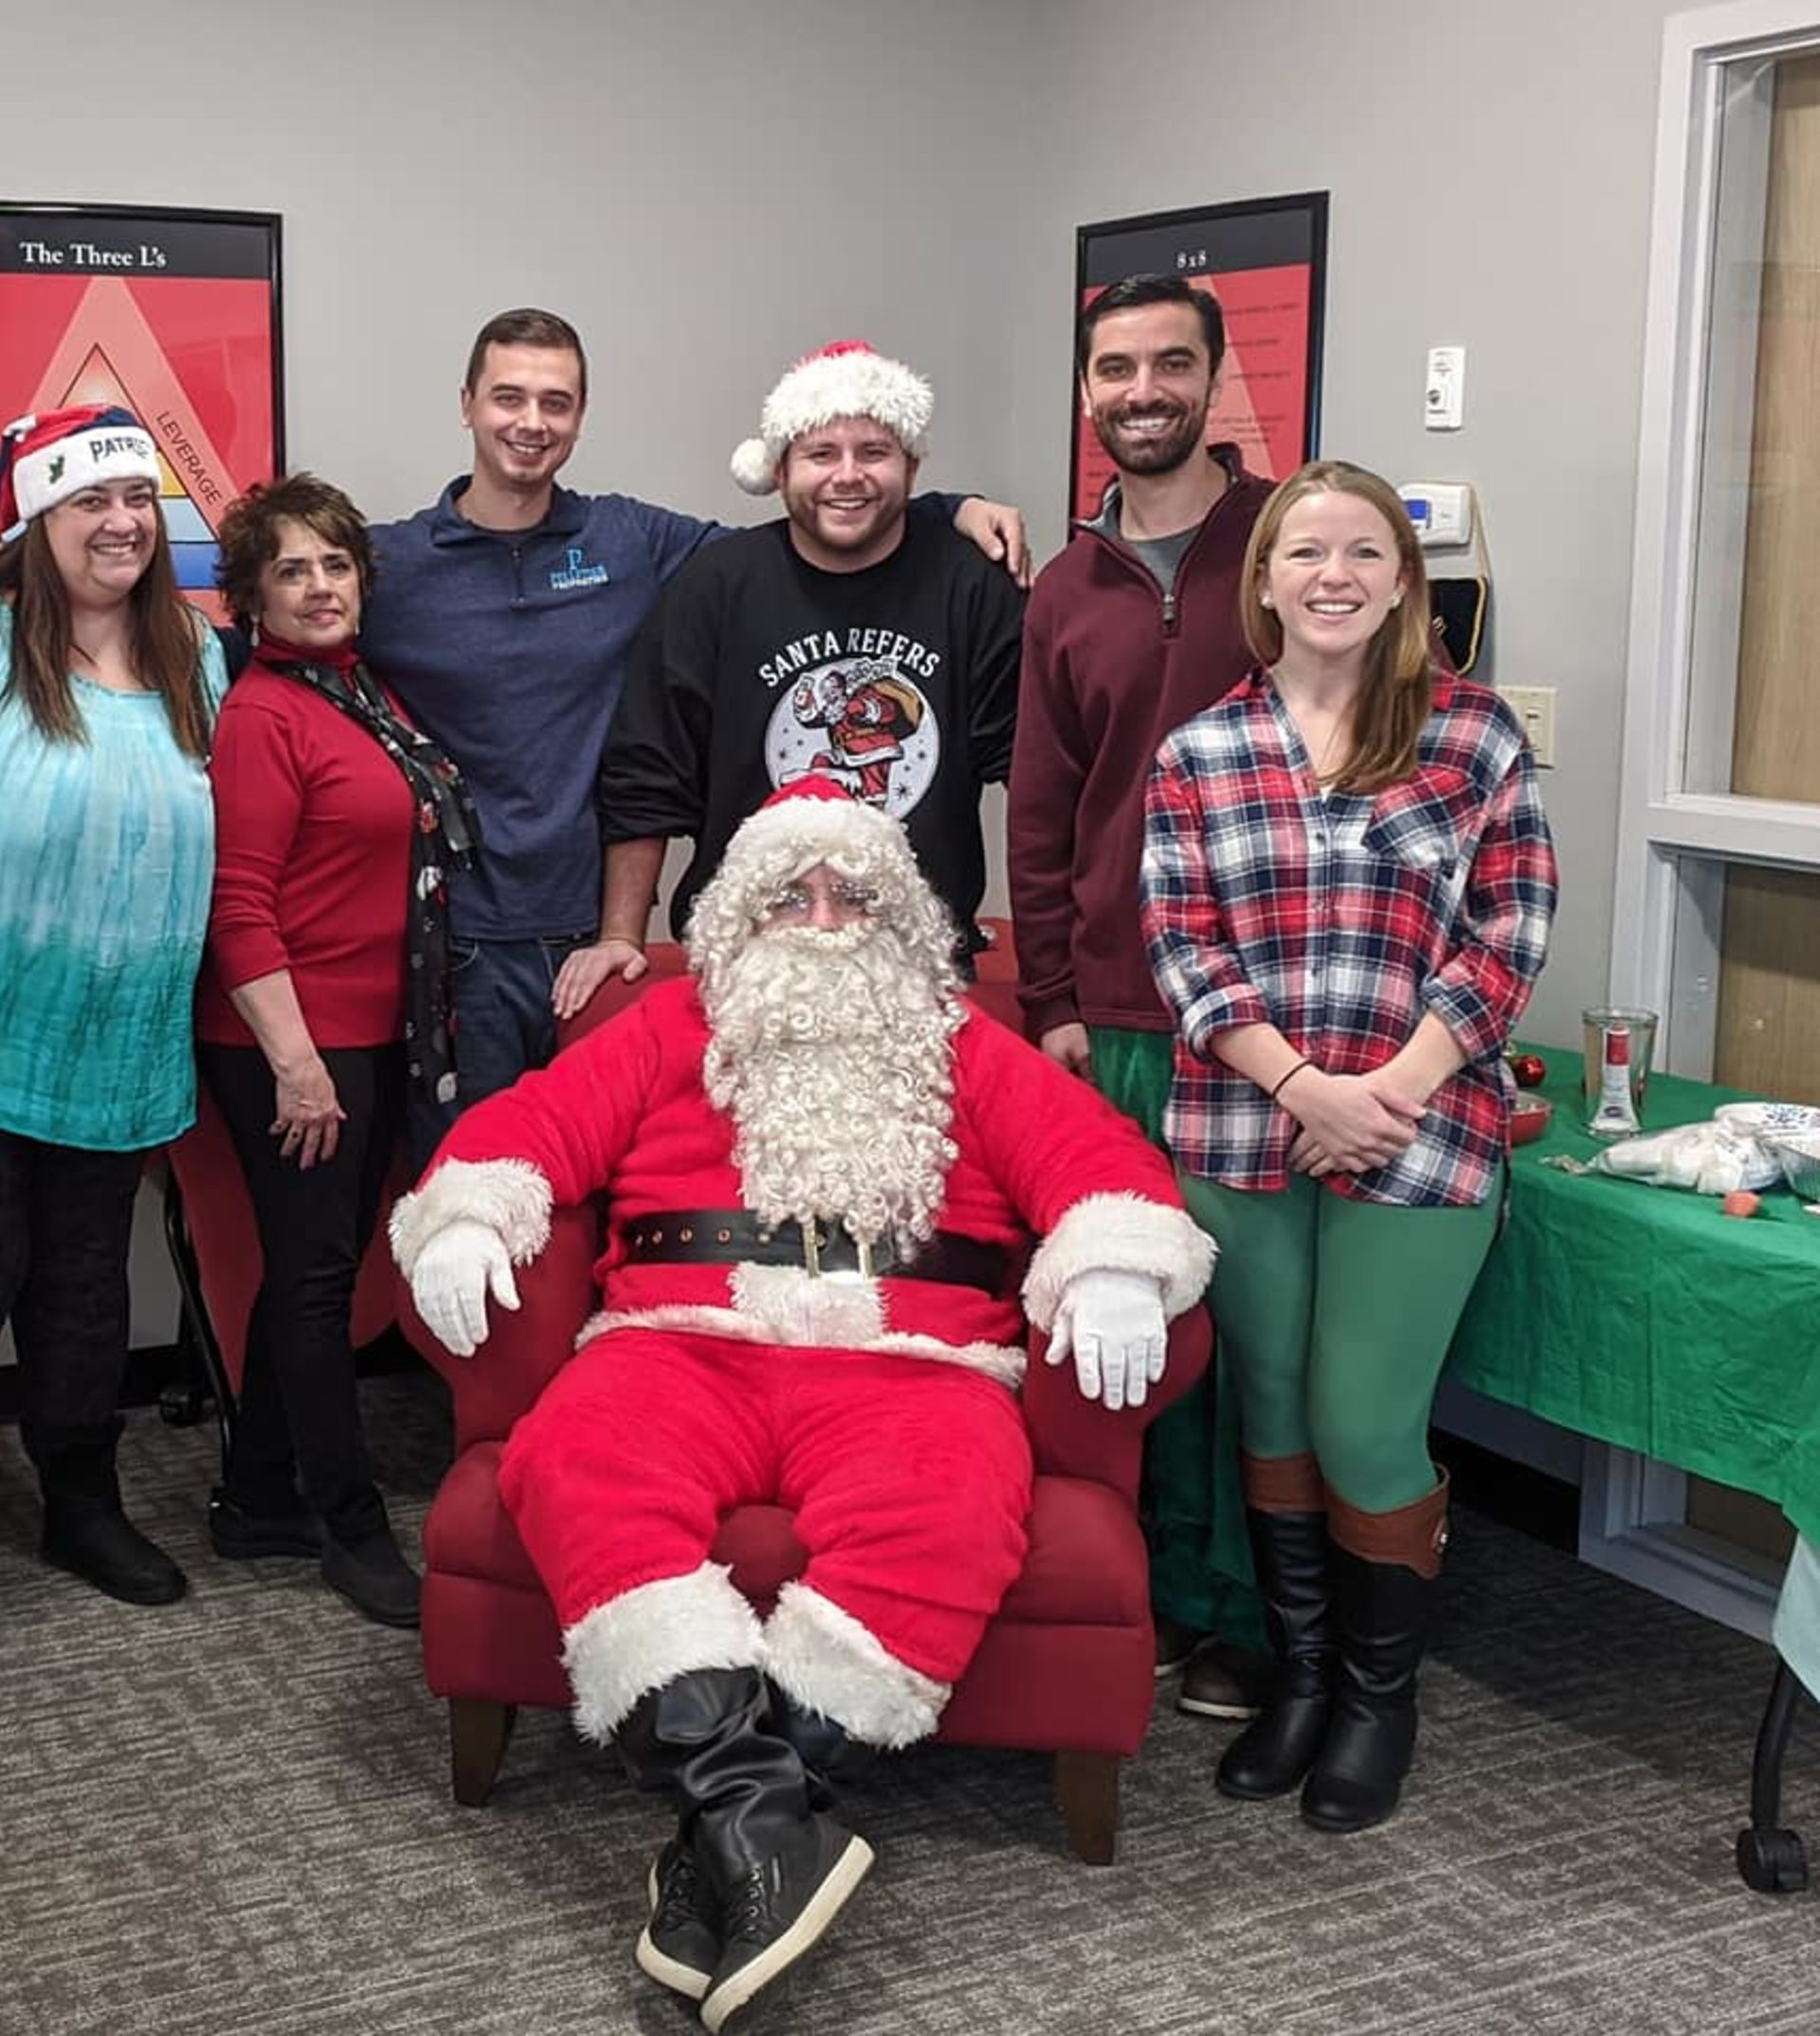 Pelletier Properties Gingerbread House Holiday Party Brings Sweet Treats and Santa!